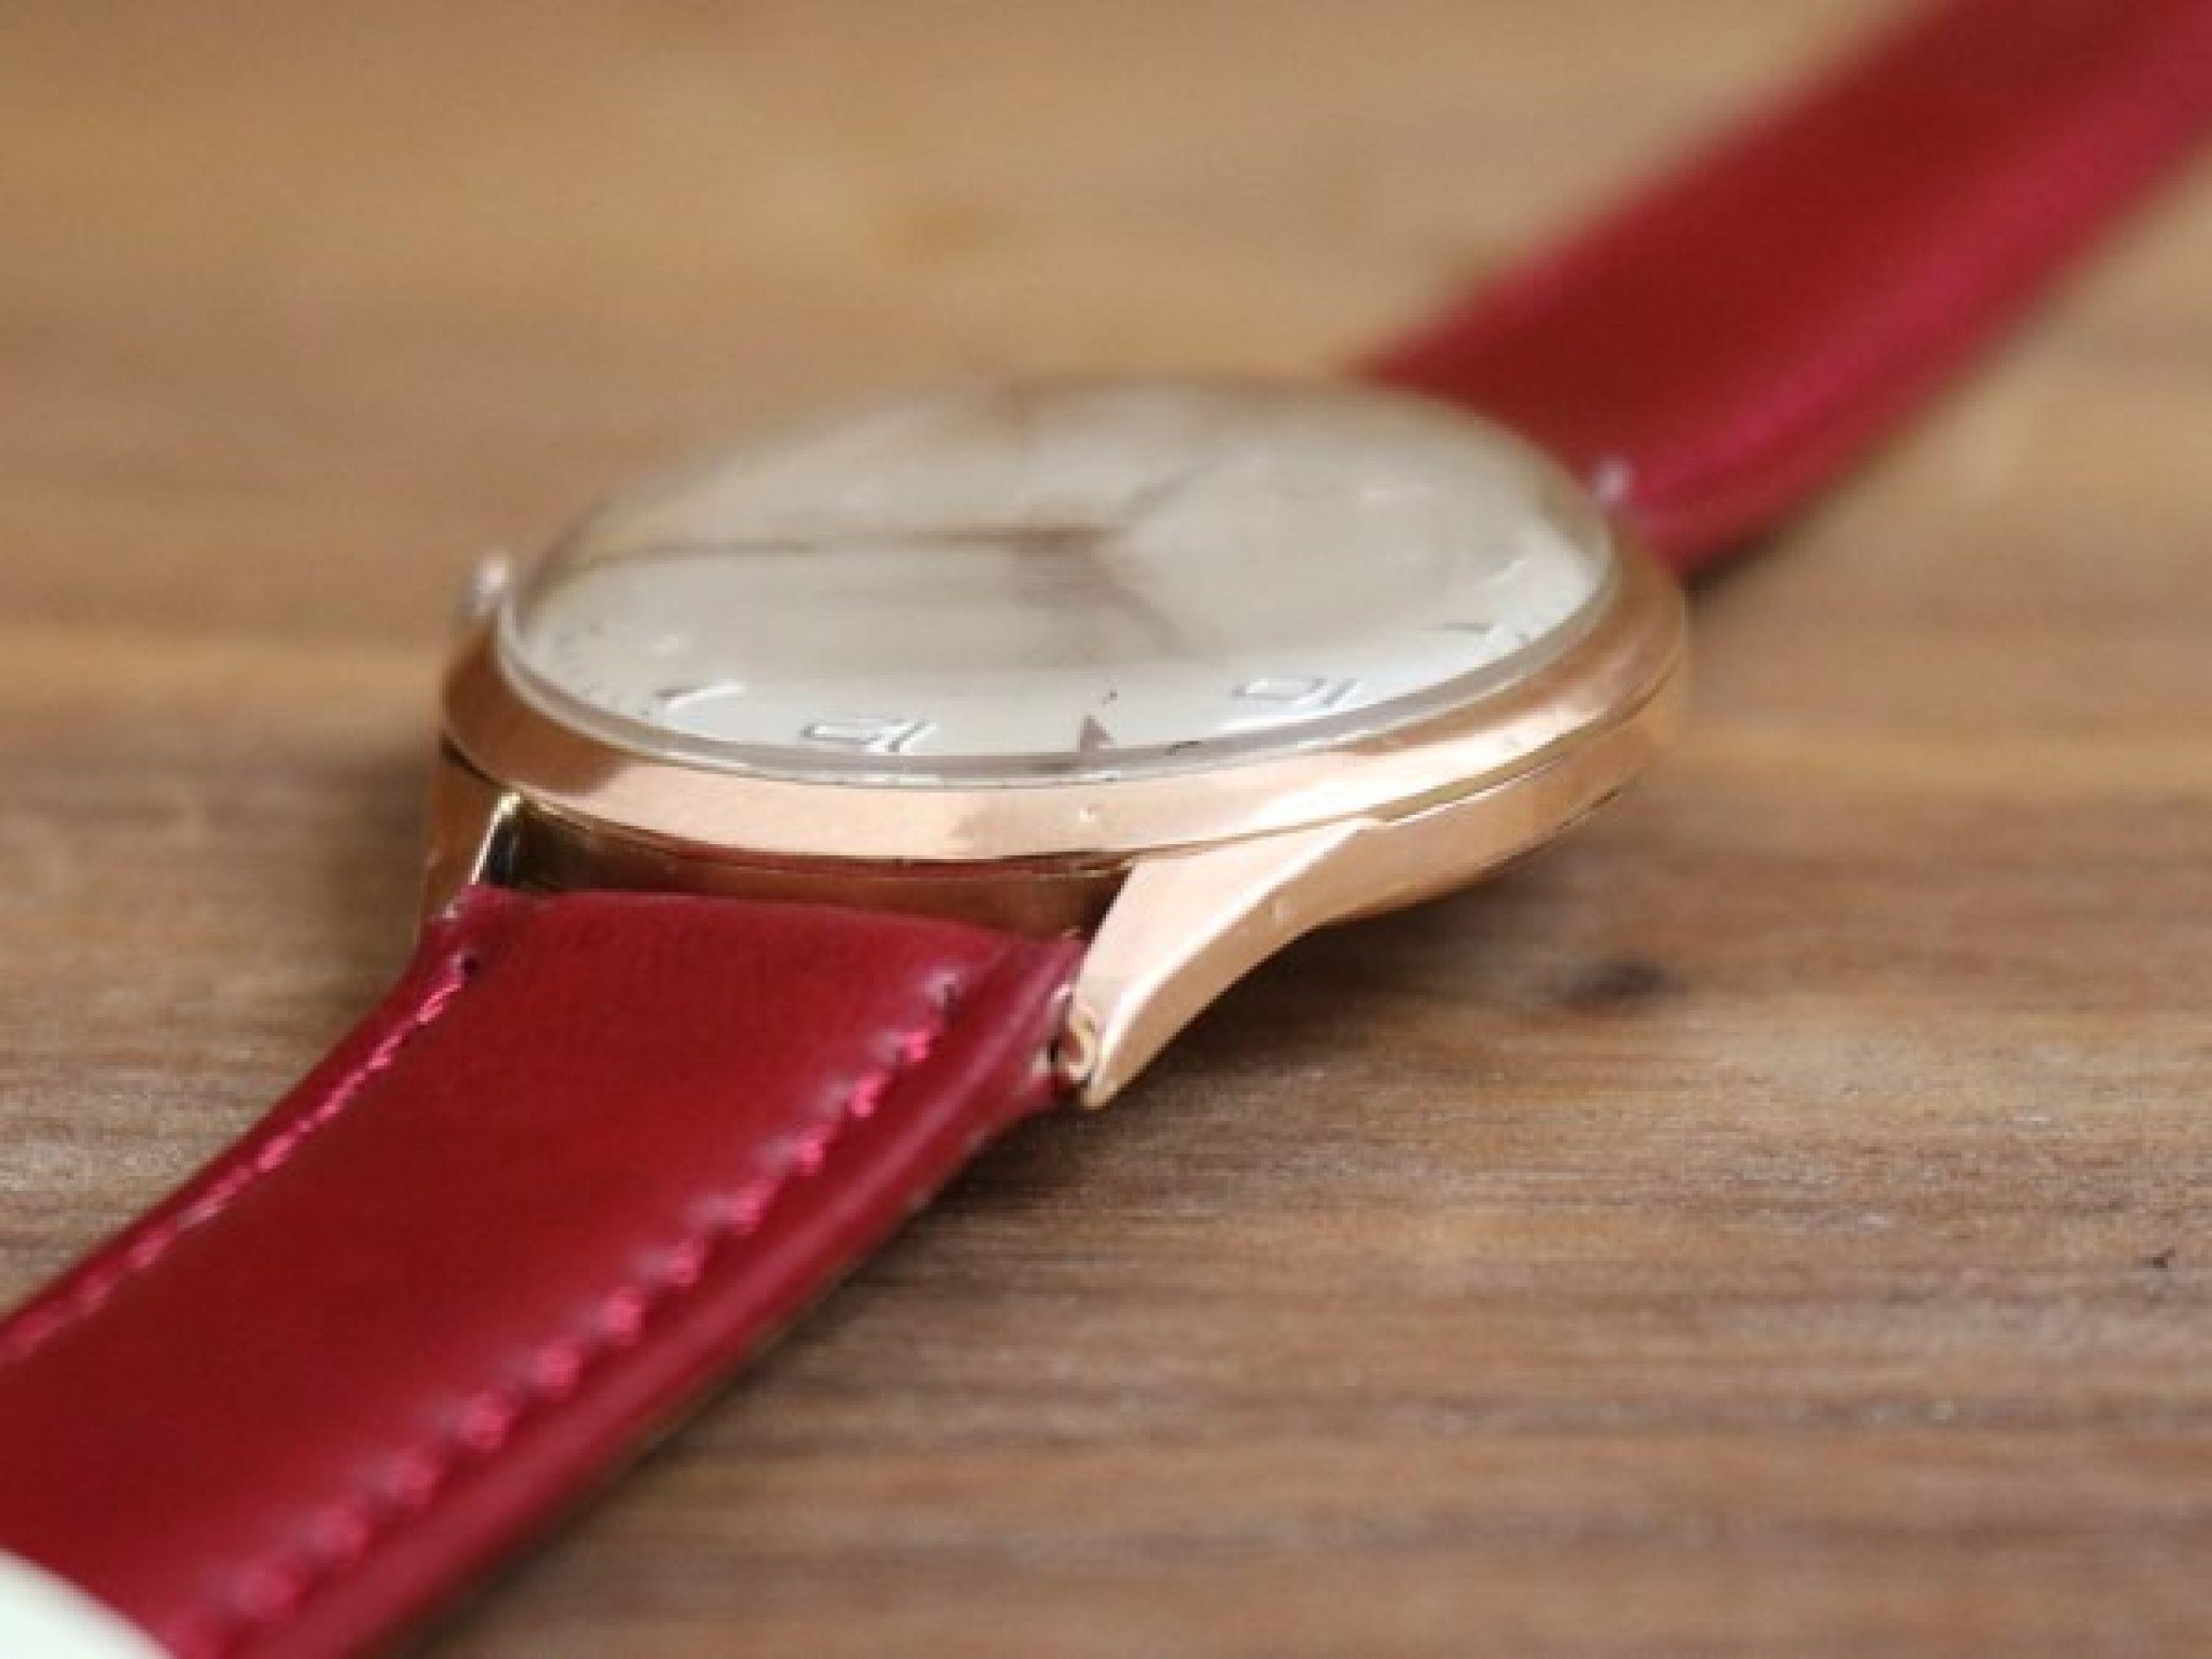 TITUS DRESS WATCH 18KT ROSE GOLD